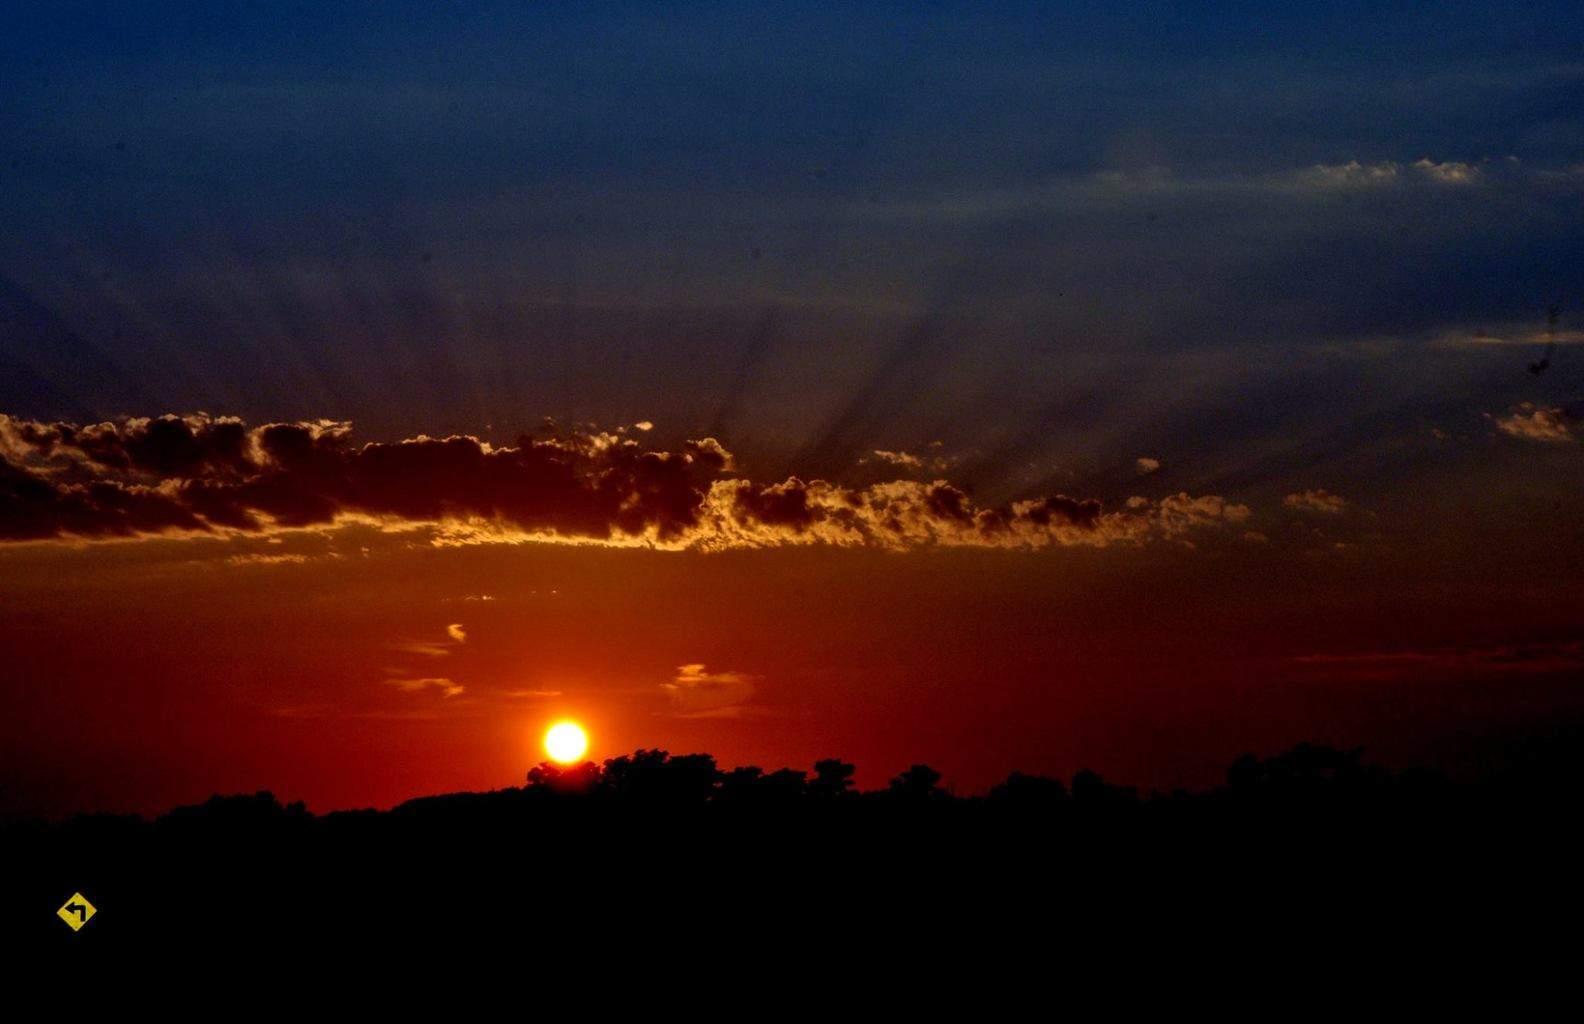 Sunset tonight. So beautiful when God paints.